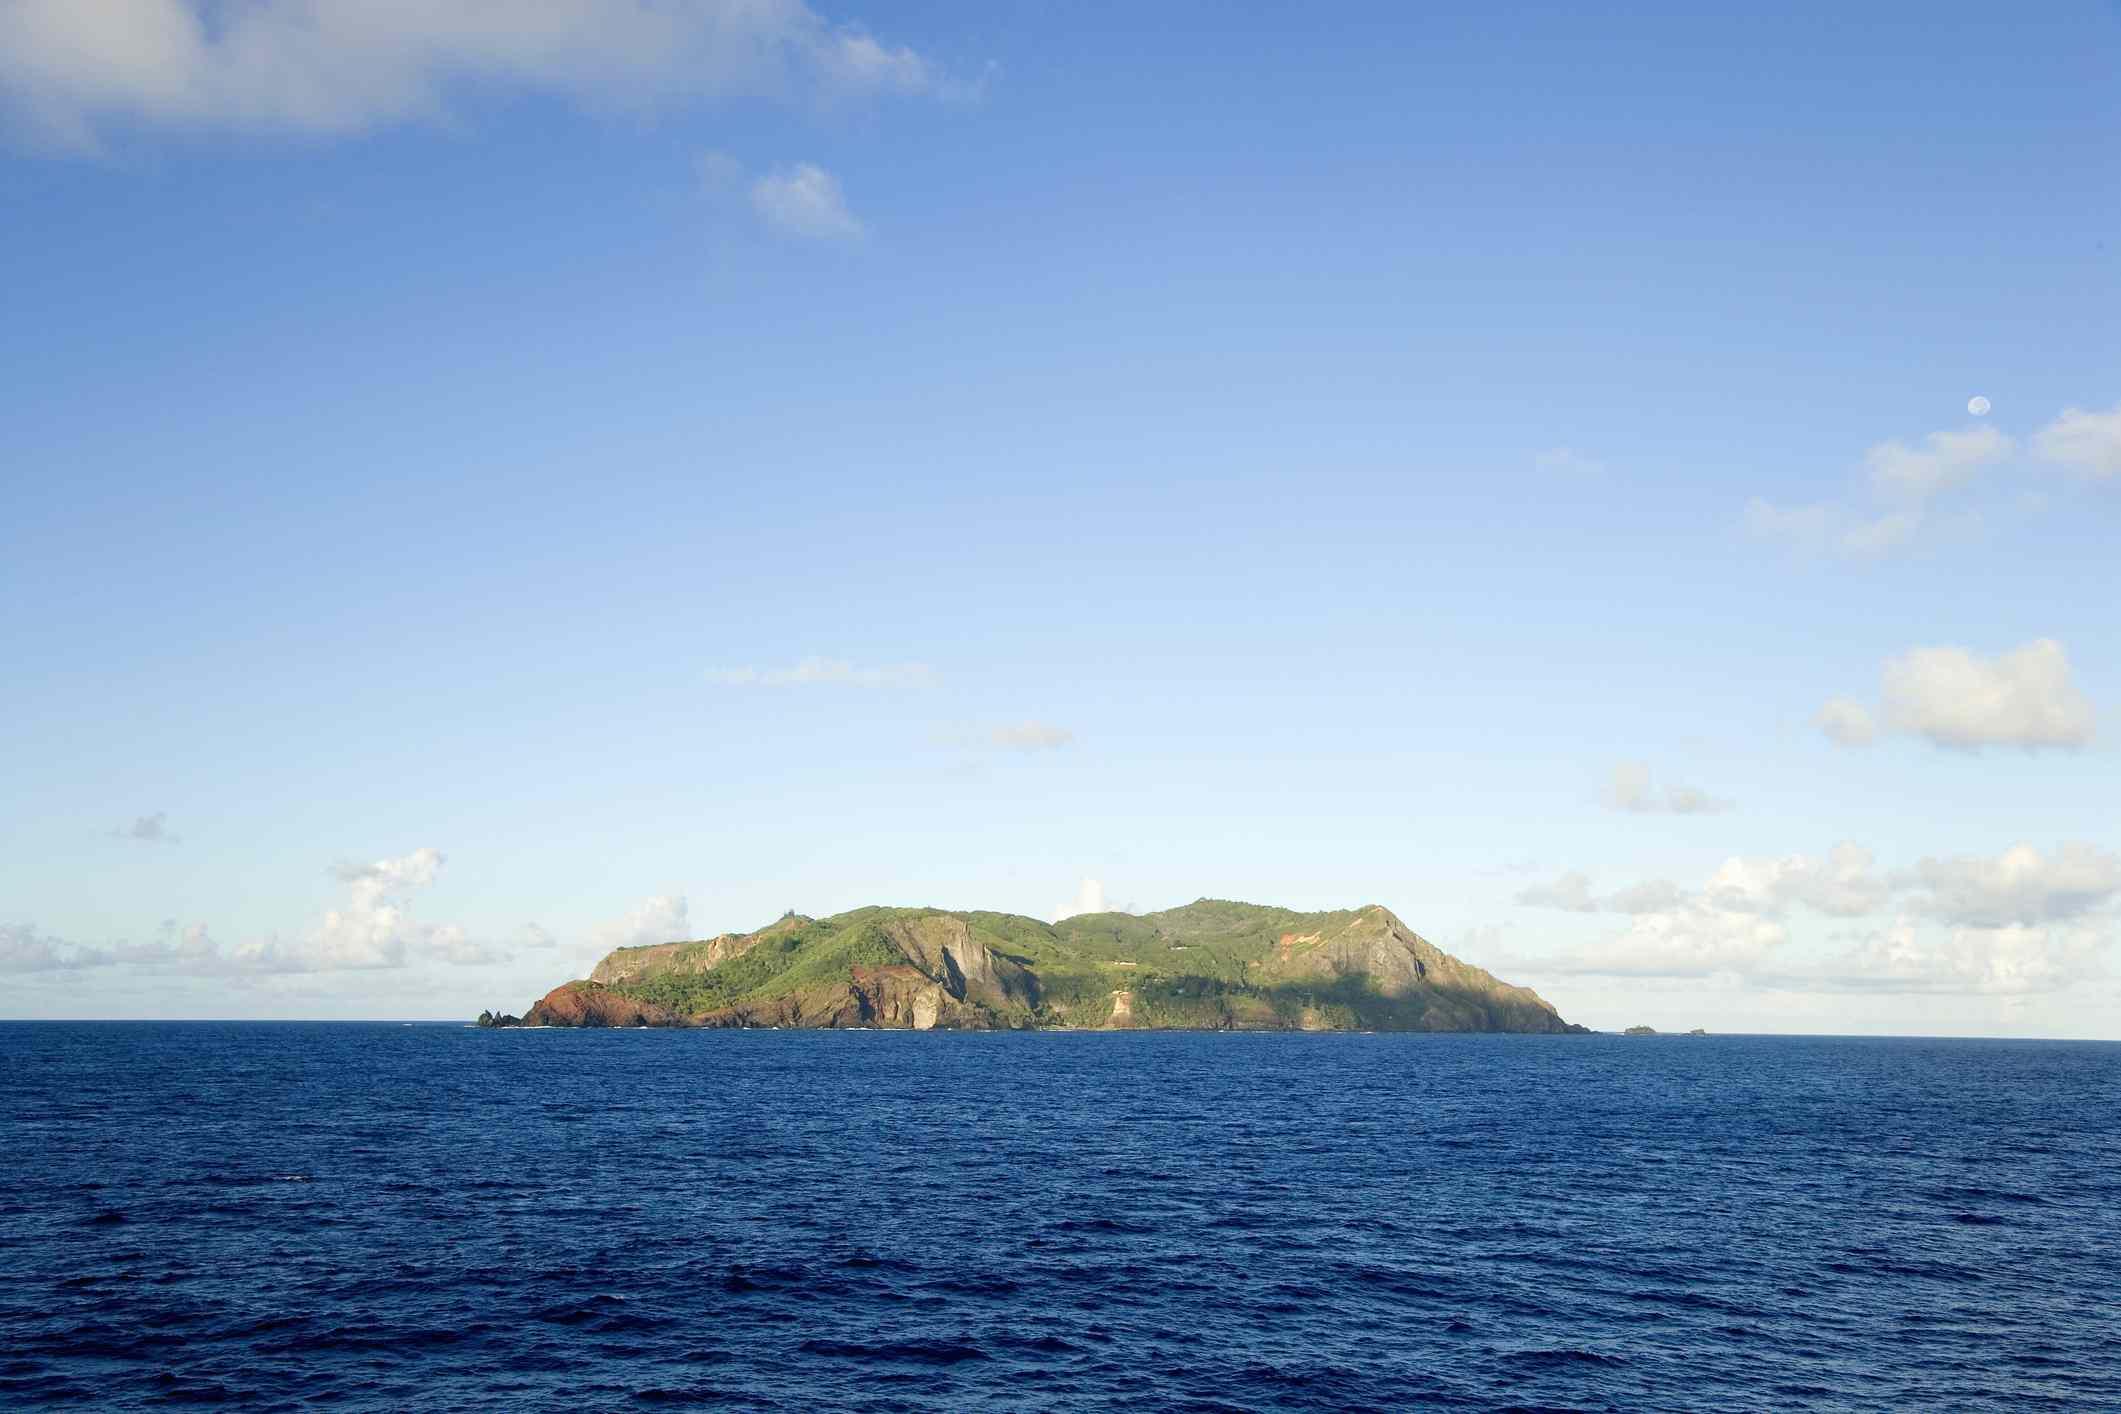 View of Pitcairn Island